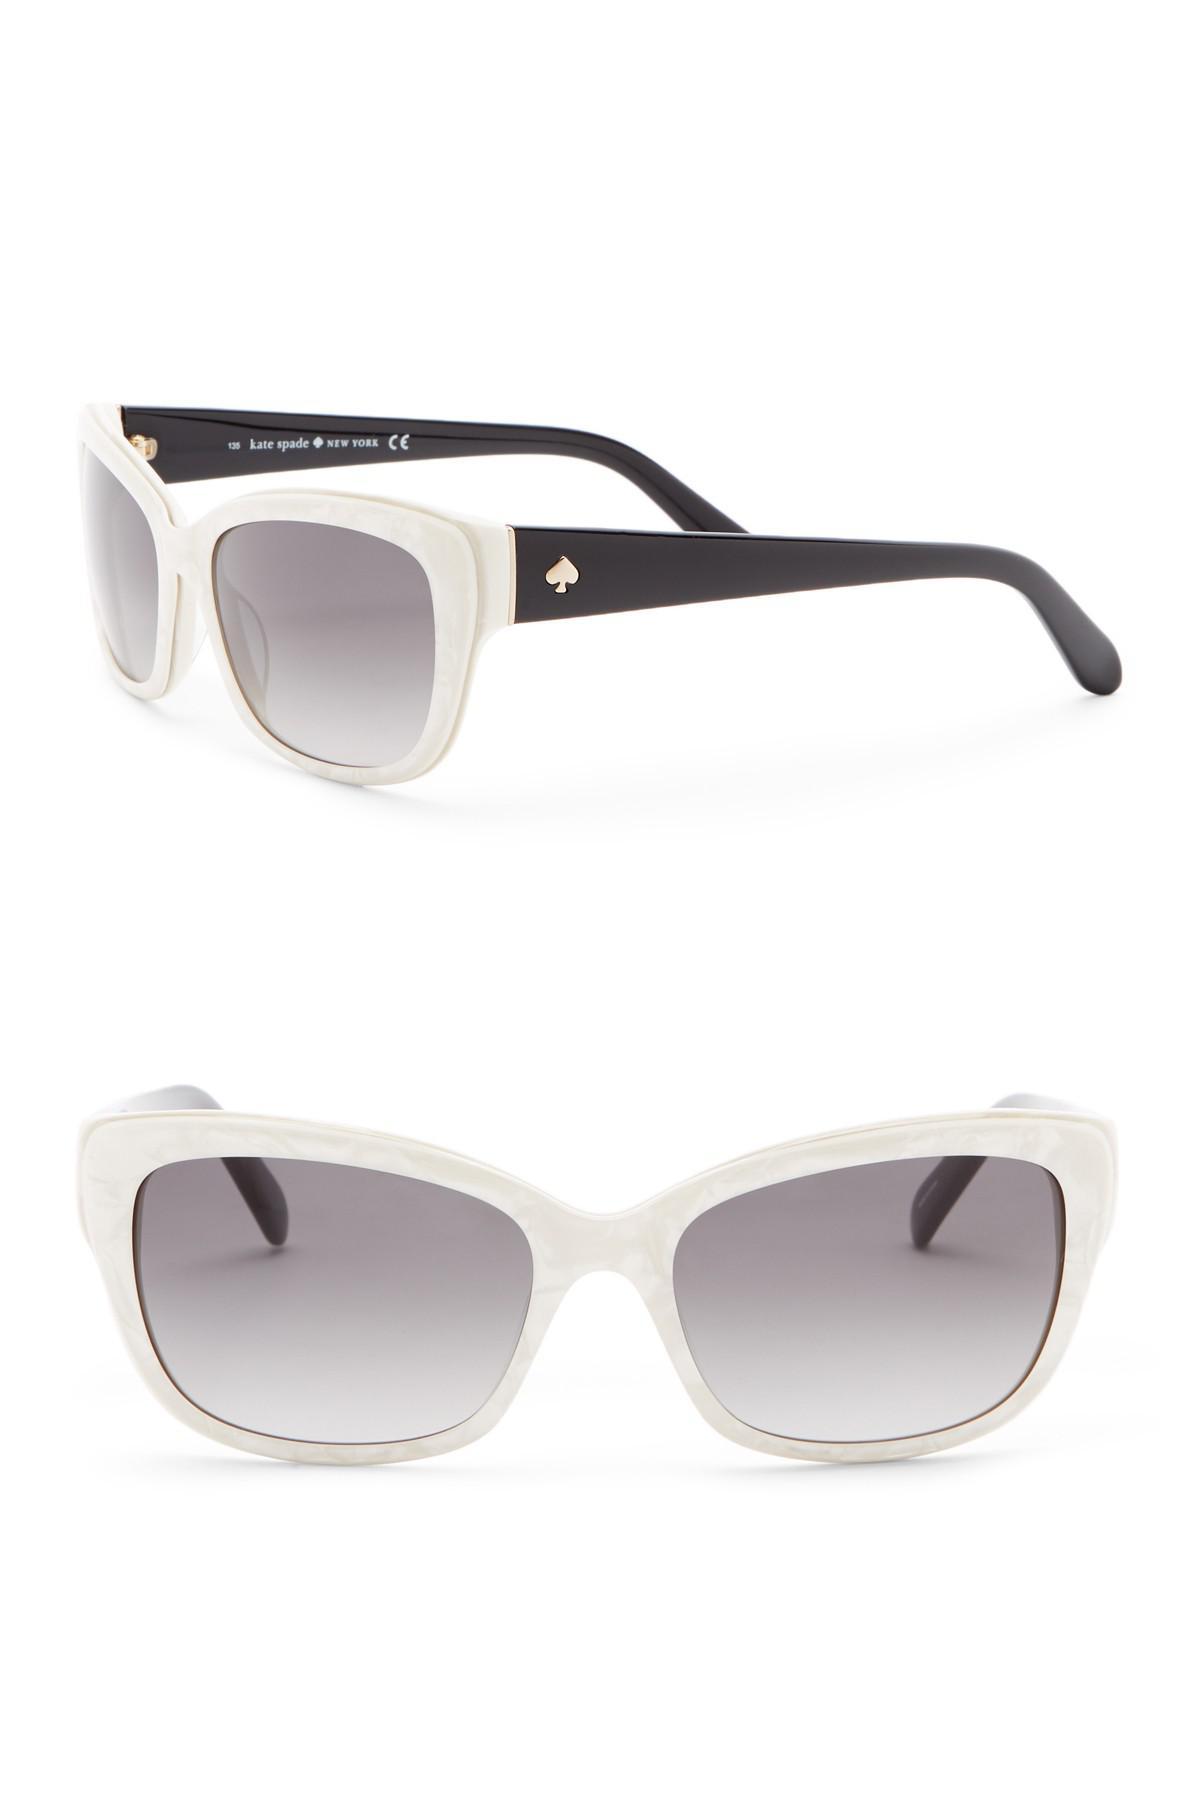 4b458ca2fac1 Lyst - Kate Spade Johanna 53mm Squared Cat Eye Sunglasses